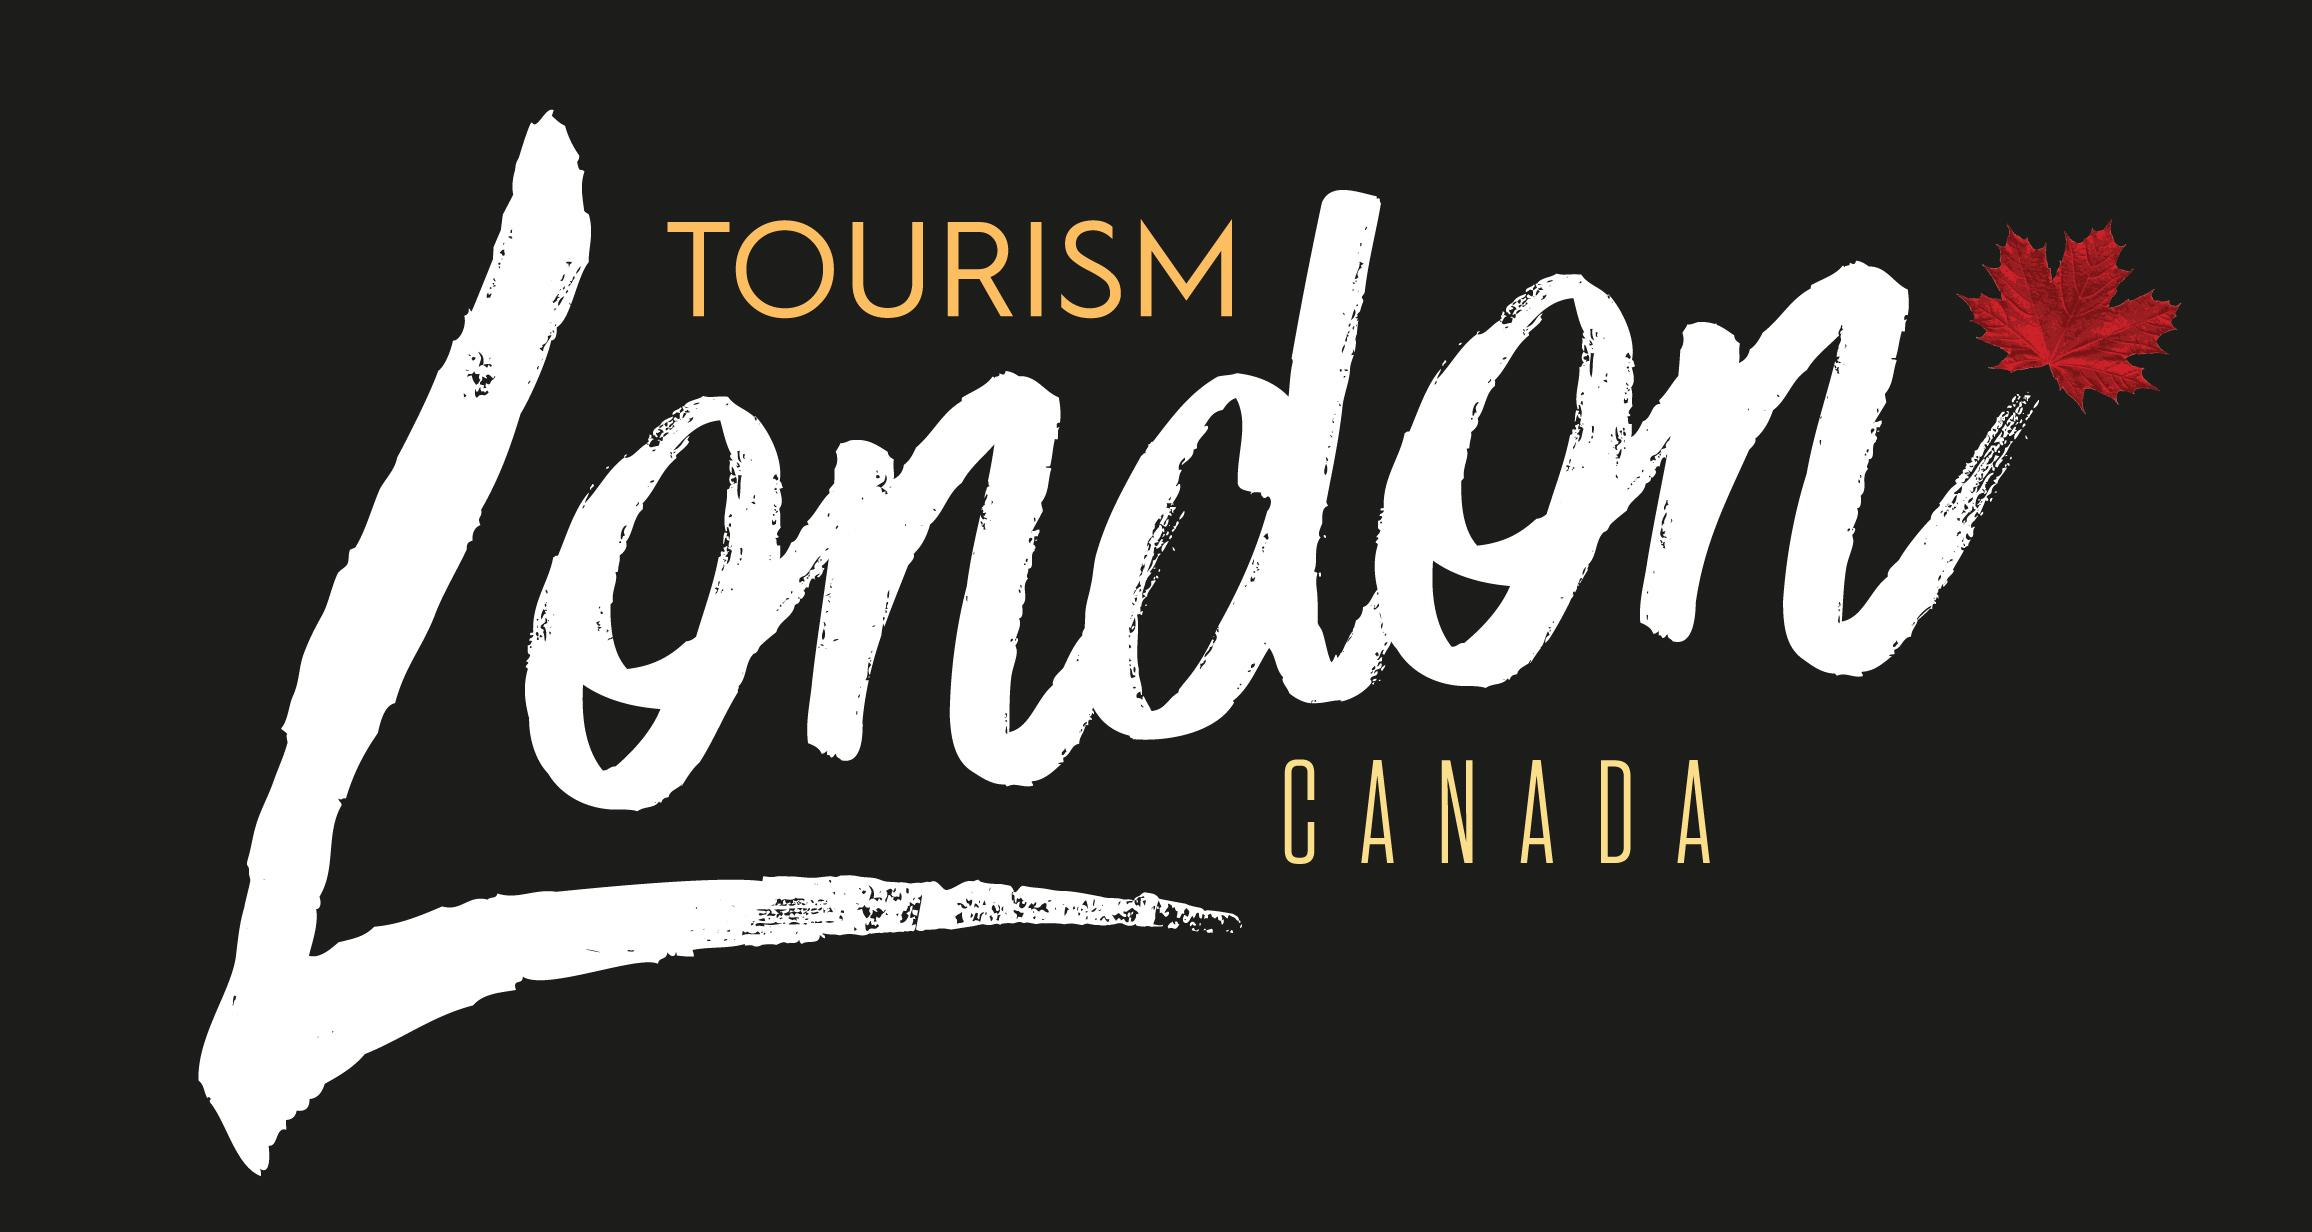 Tourism London